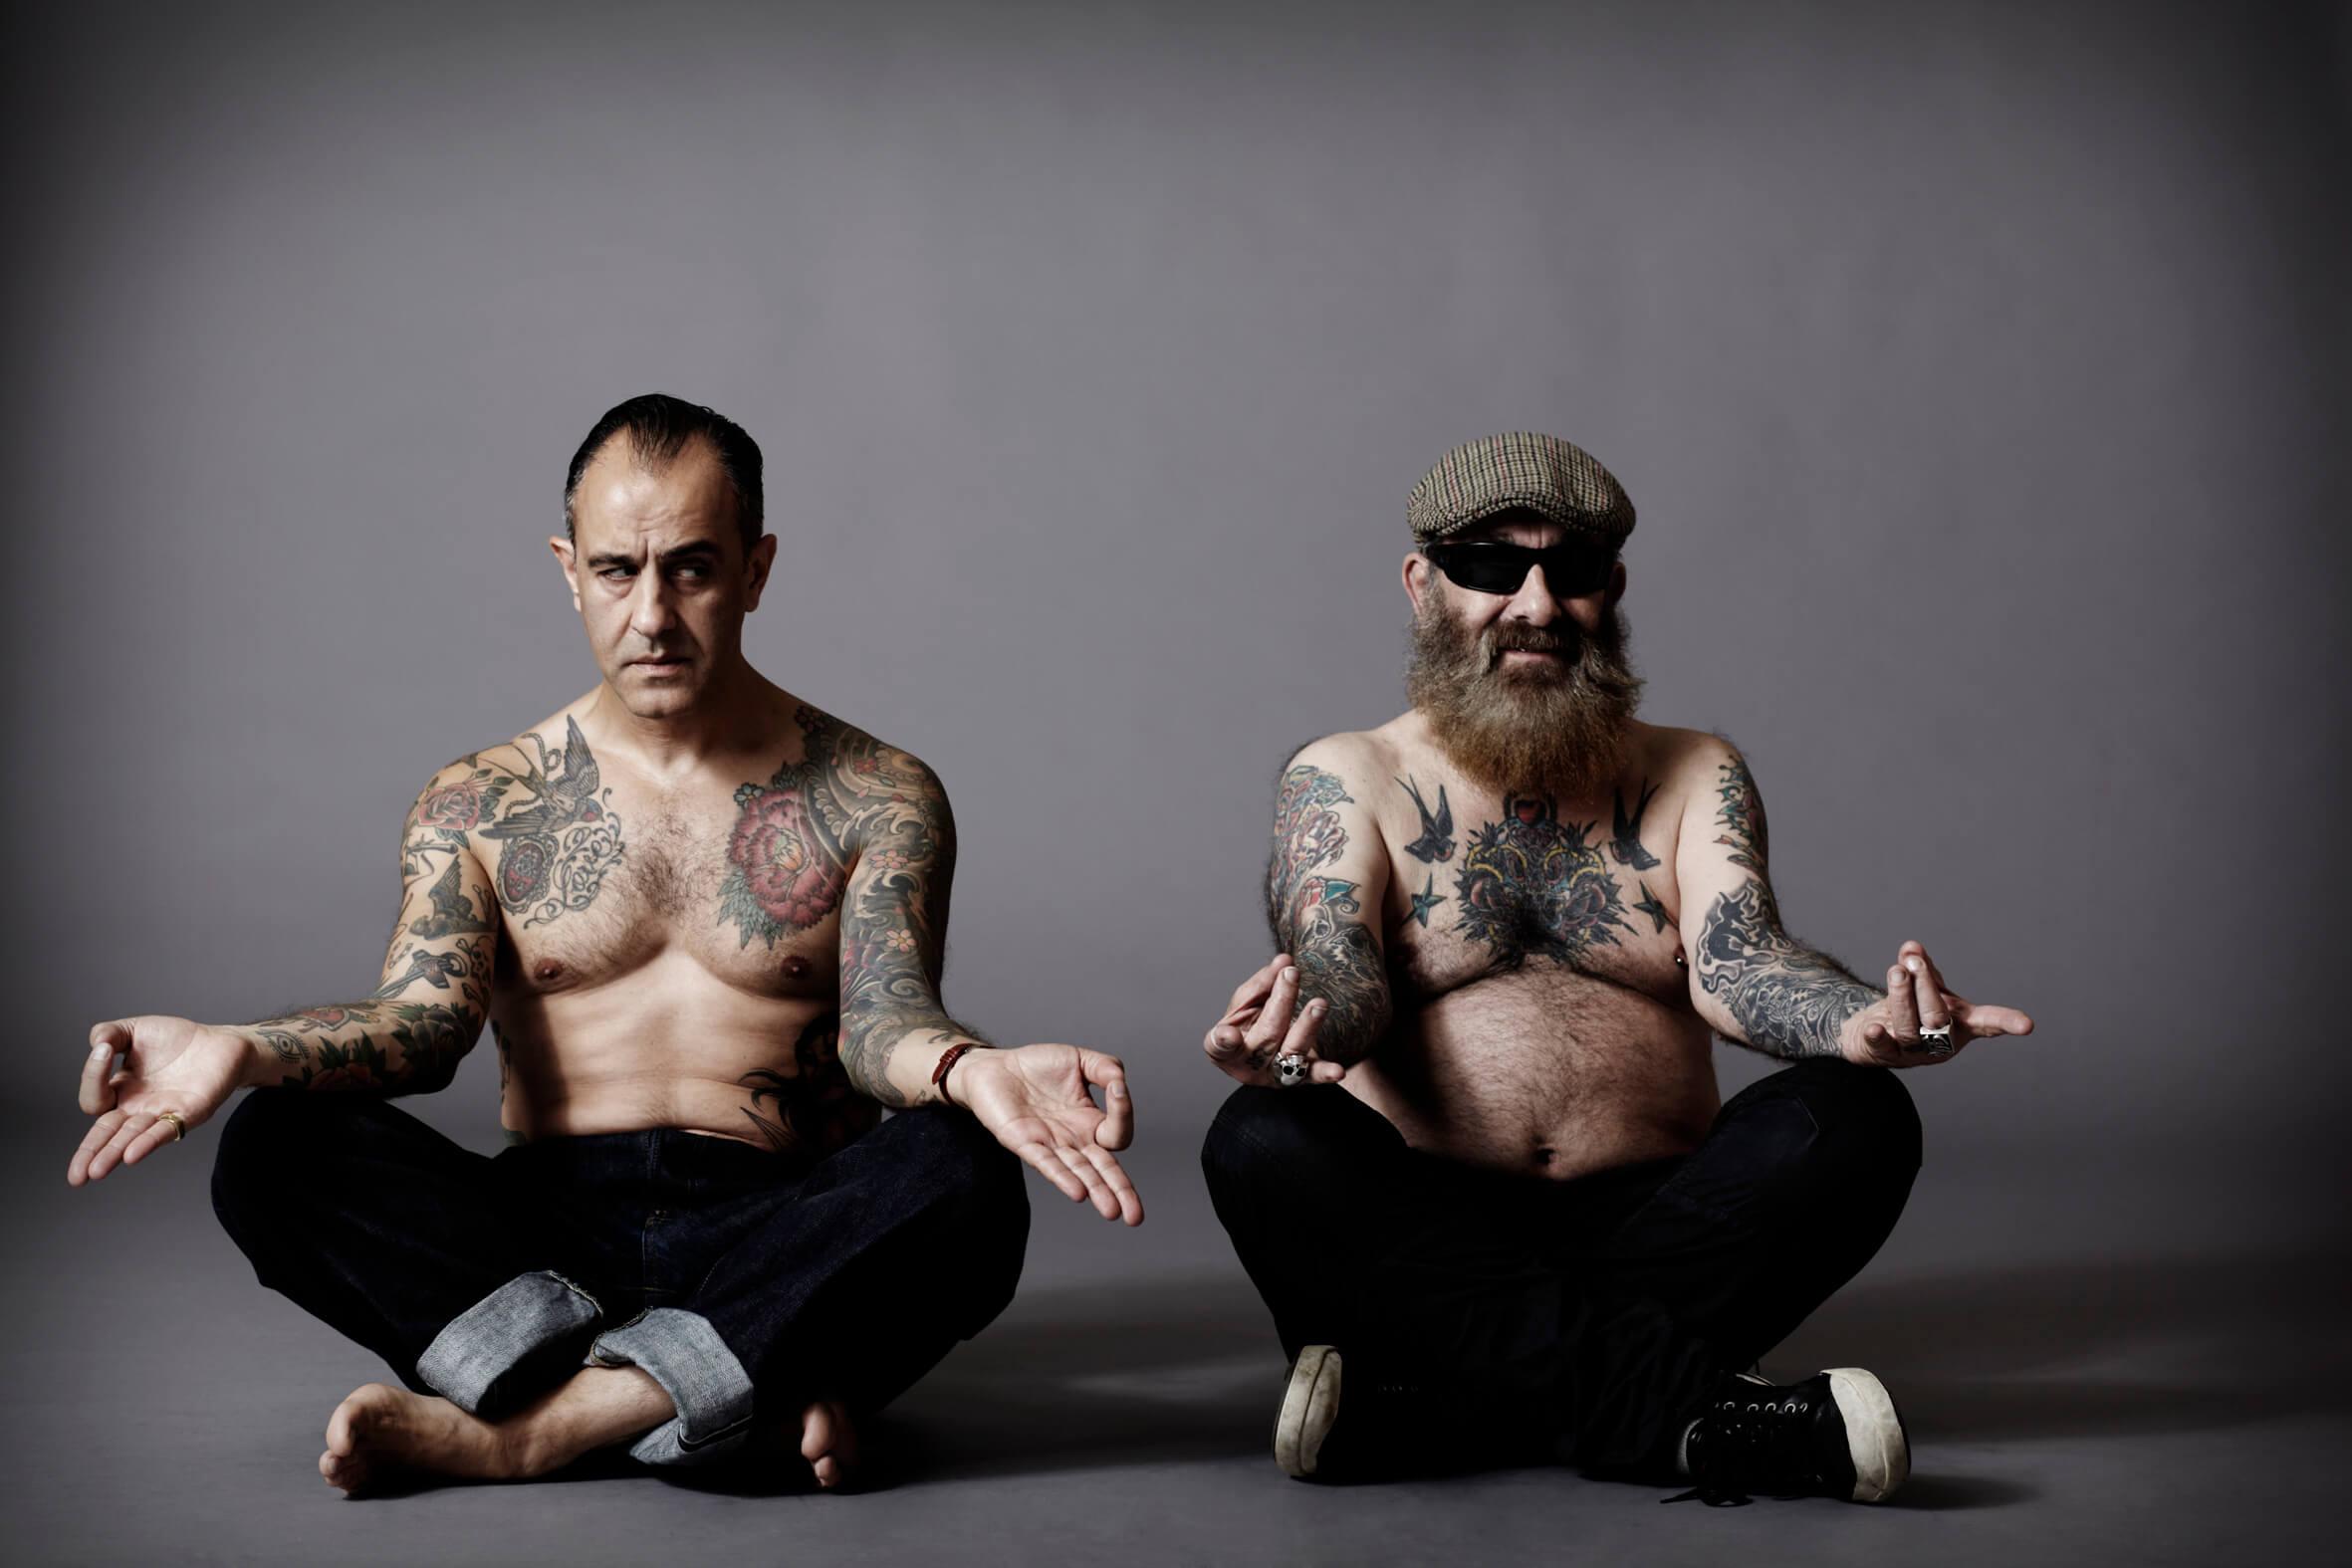 Two-Tattooed-Men-Sitting-Down